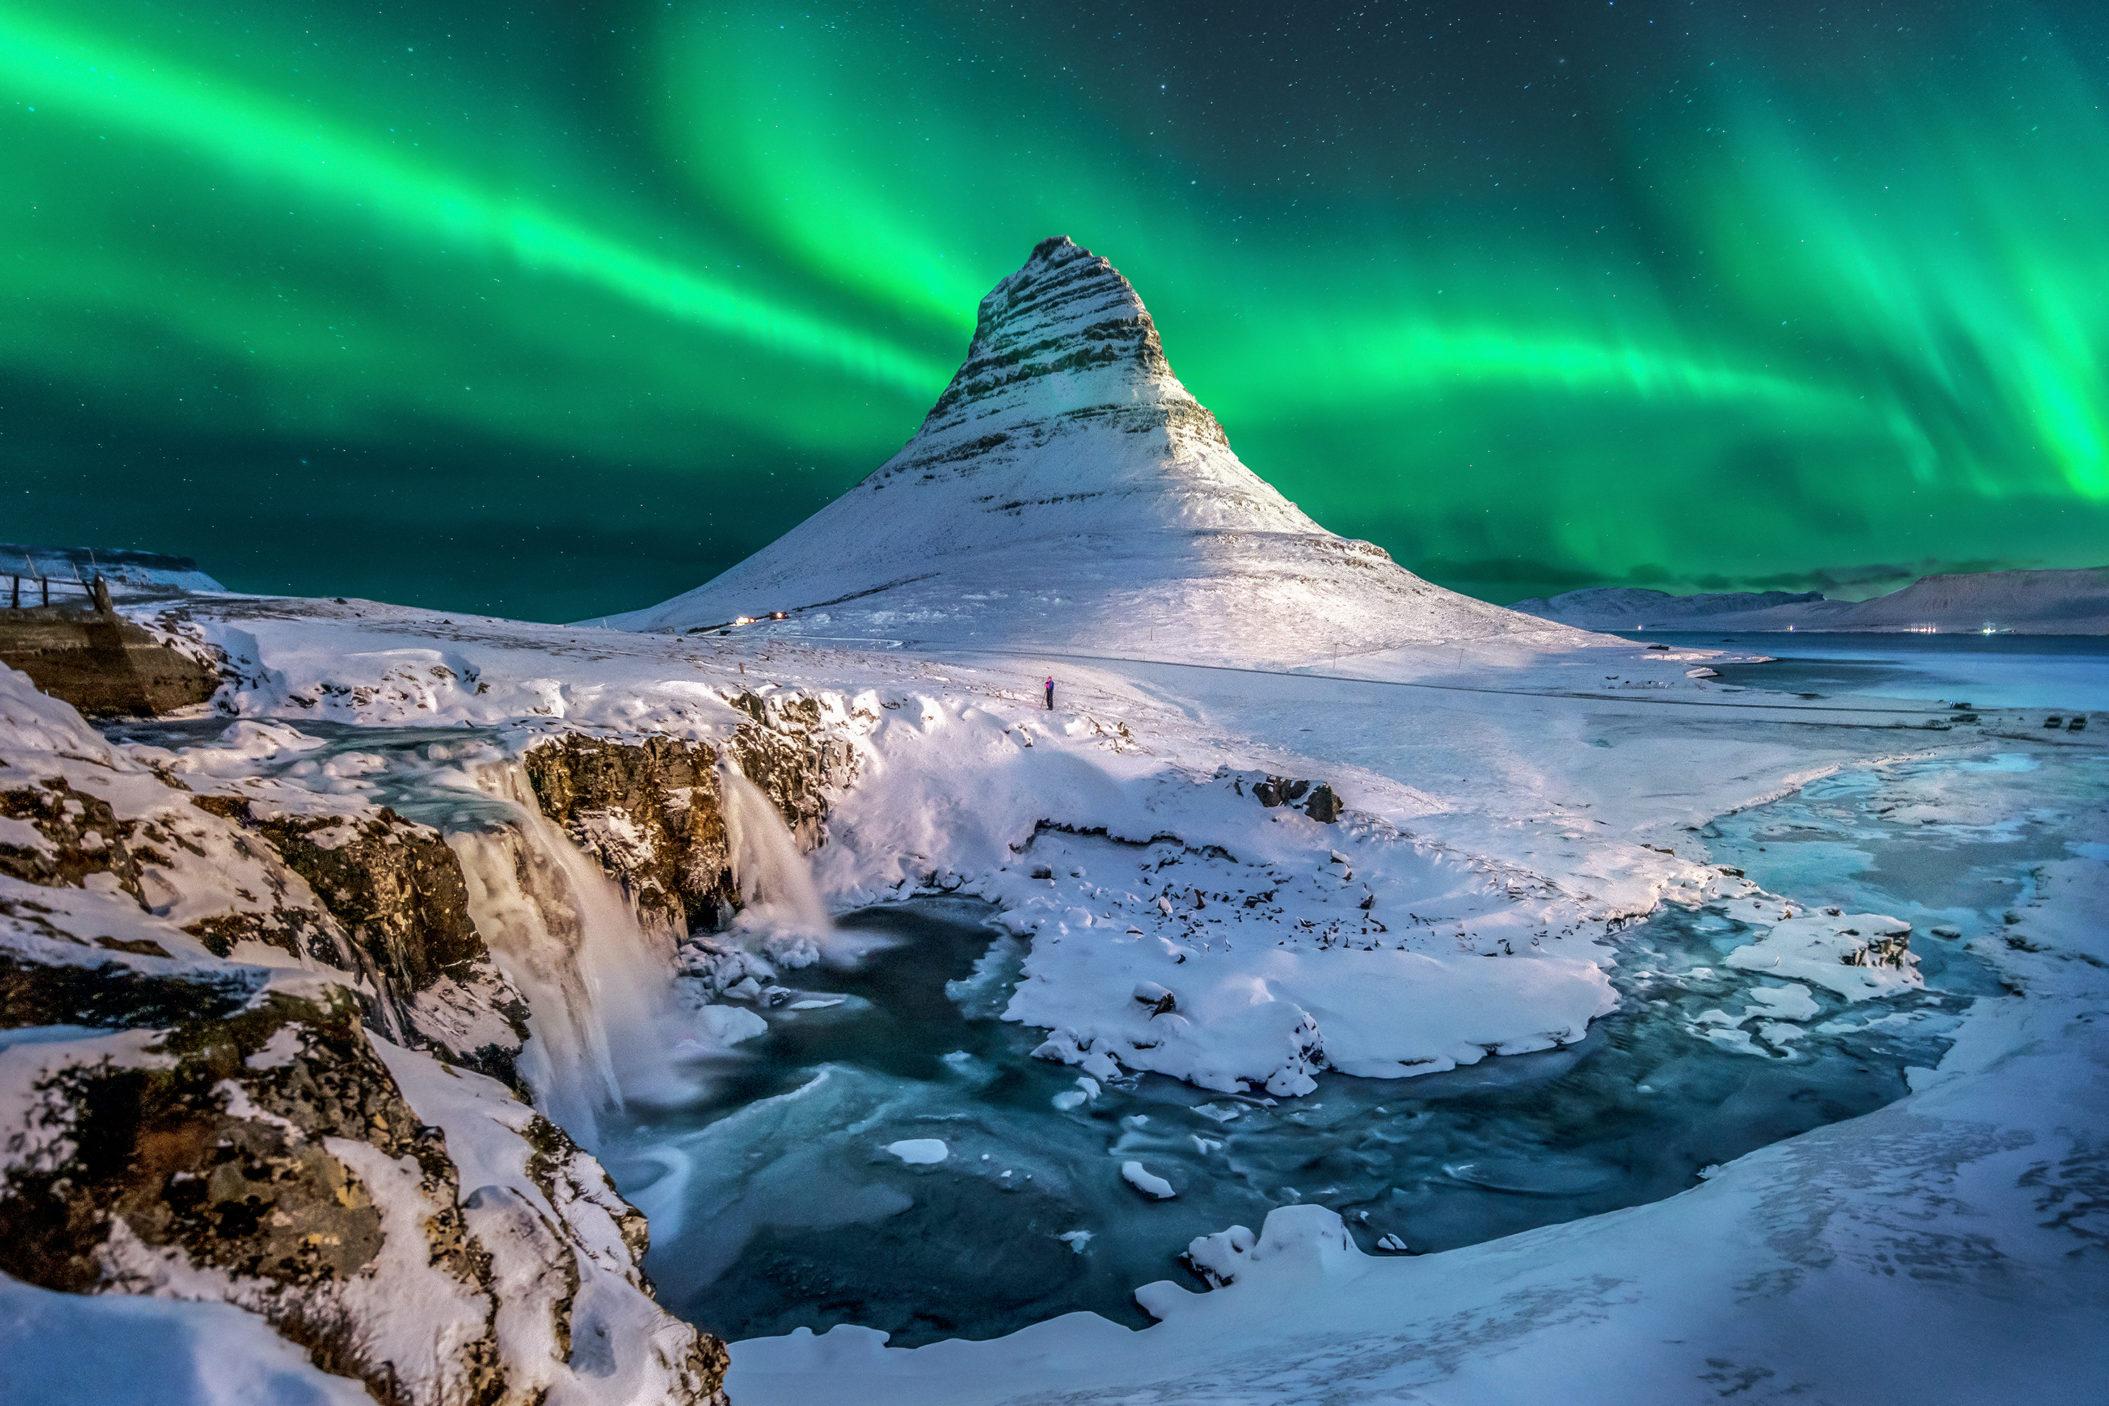 Iceland [Shutterstock]